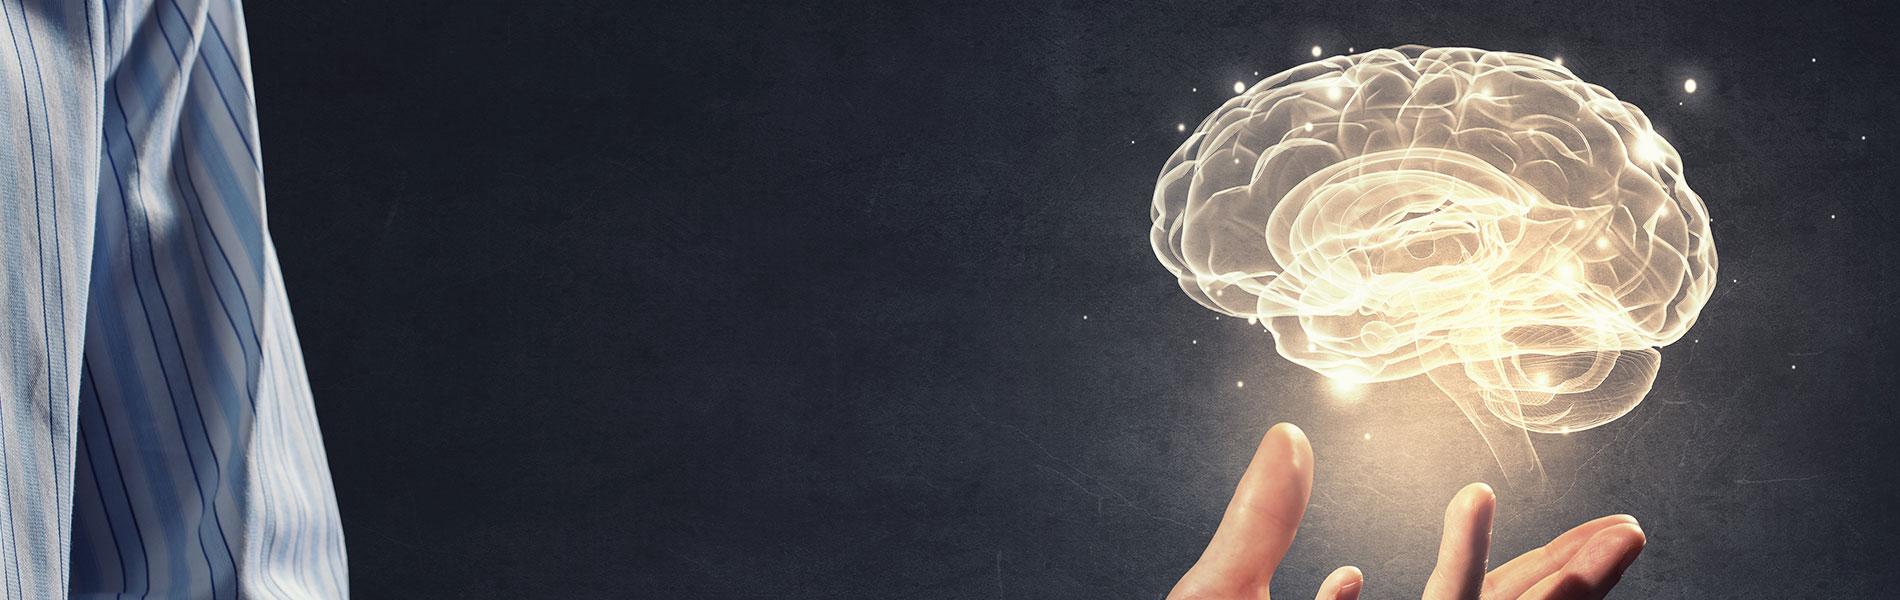 Seminole County Brain Injury Attorney